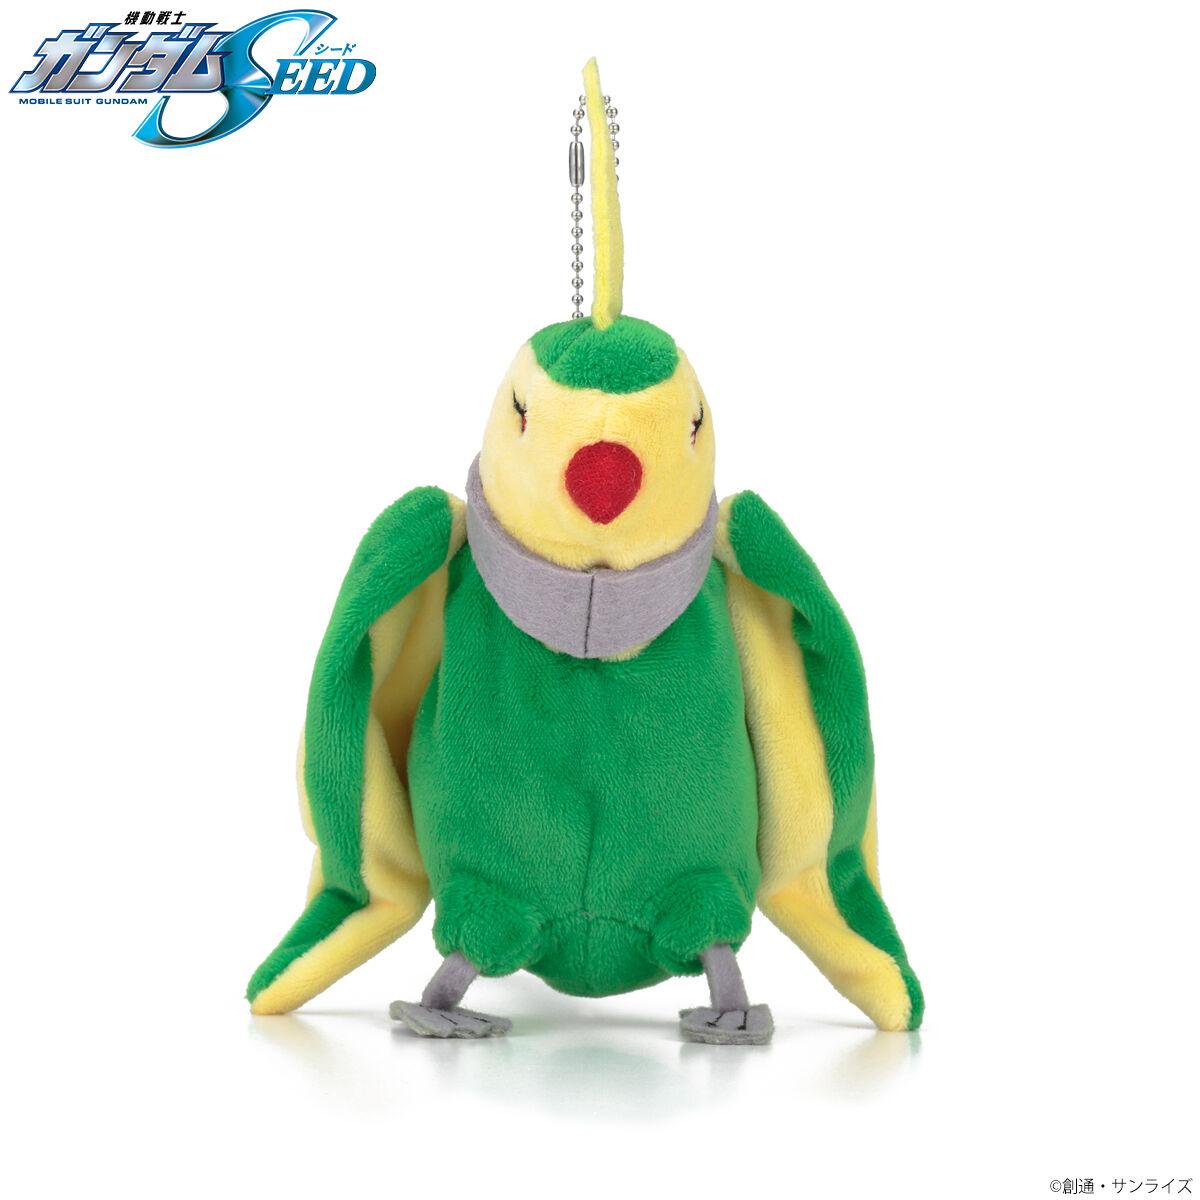 Mobile Suit Gundam SEED Birdy Plushie